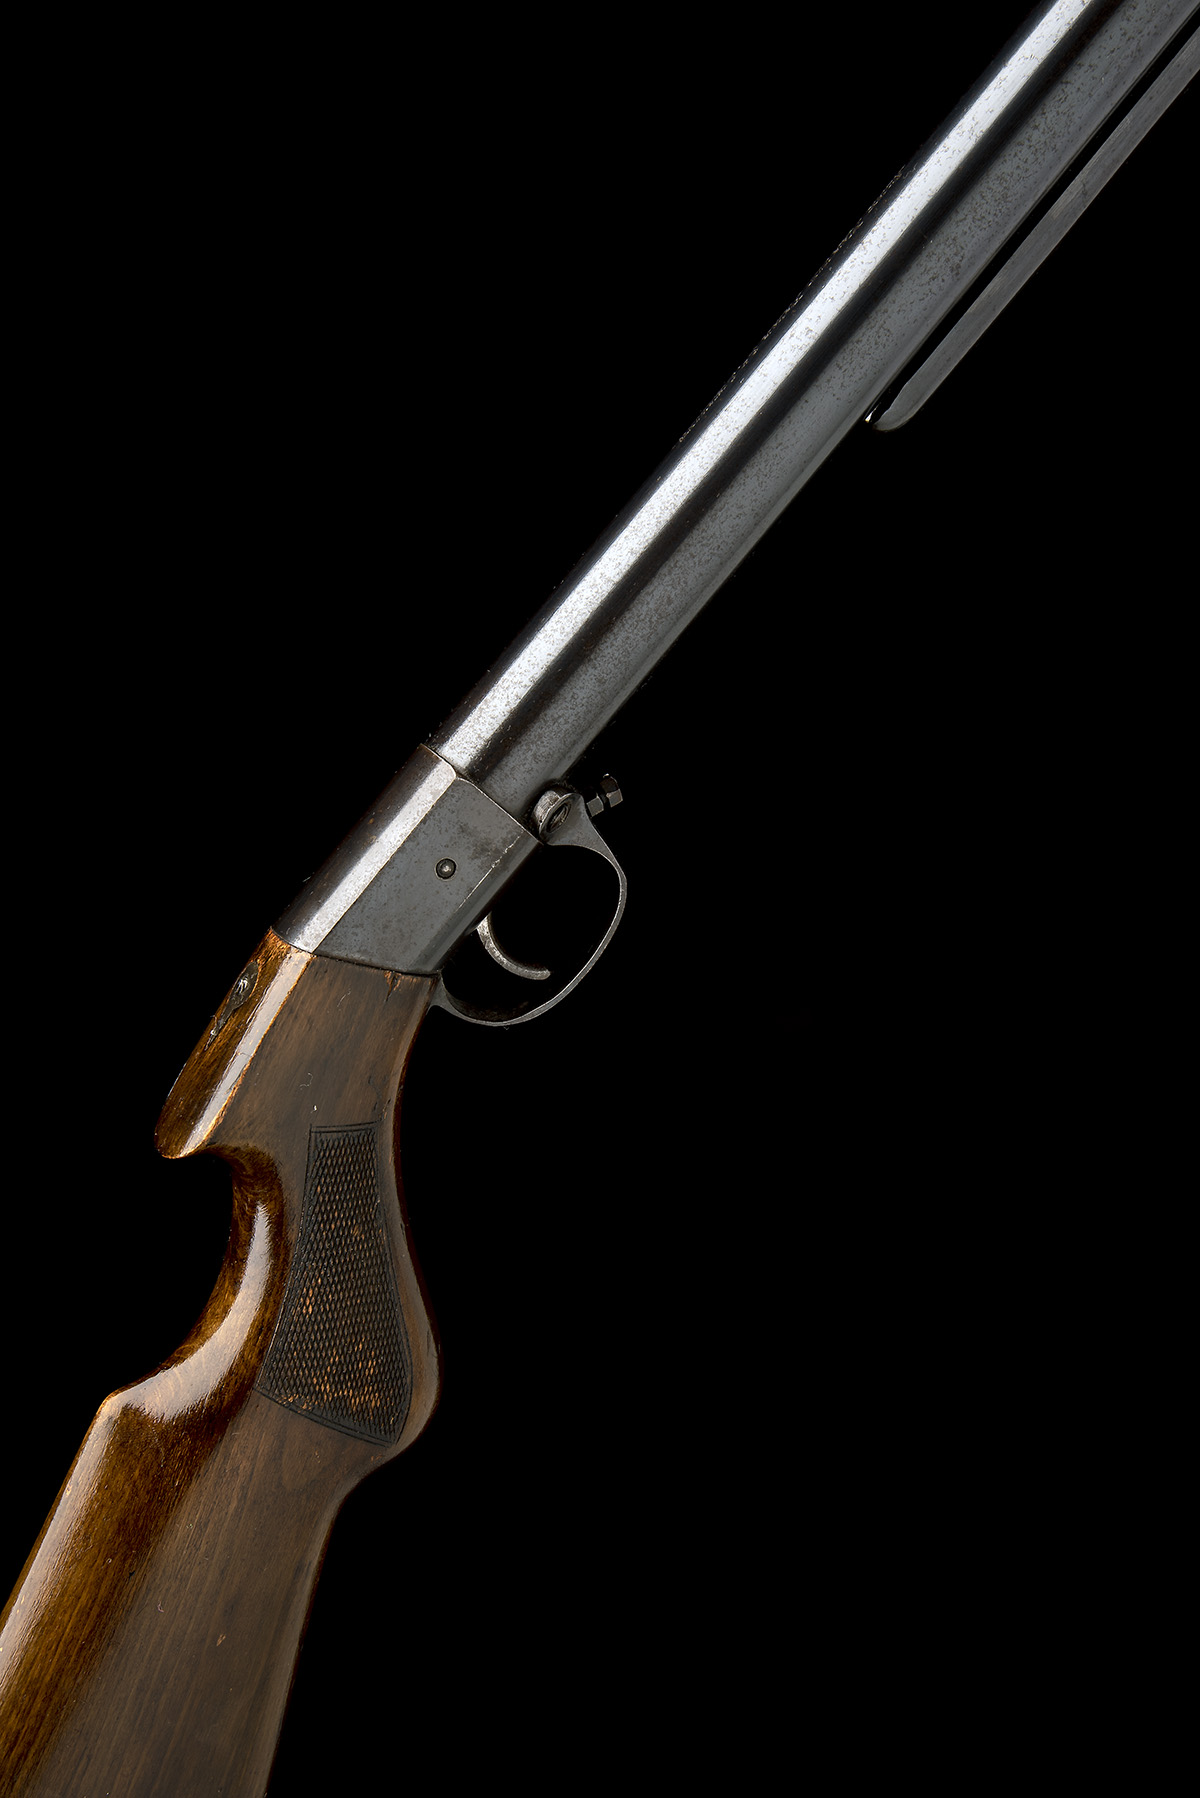 Fine Modern & Antique Arms - June 2021